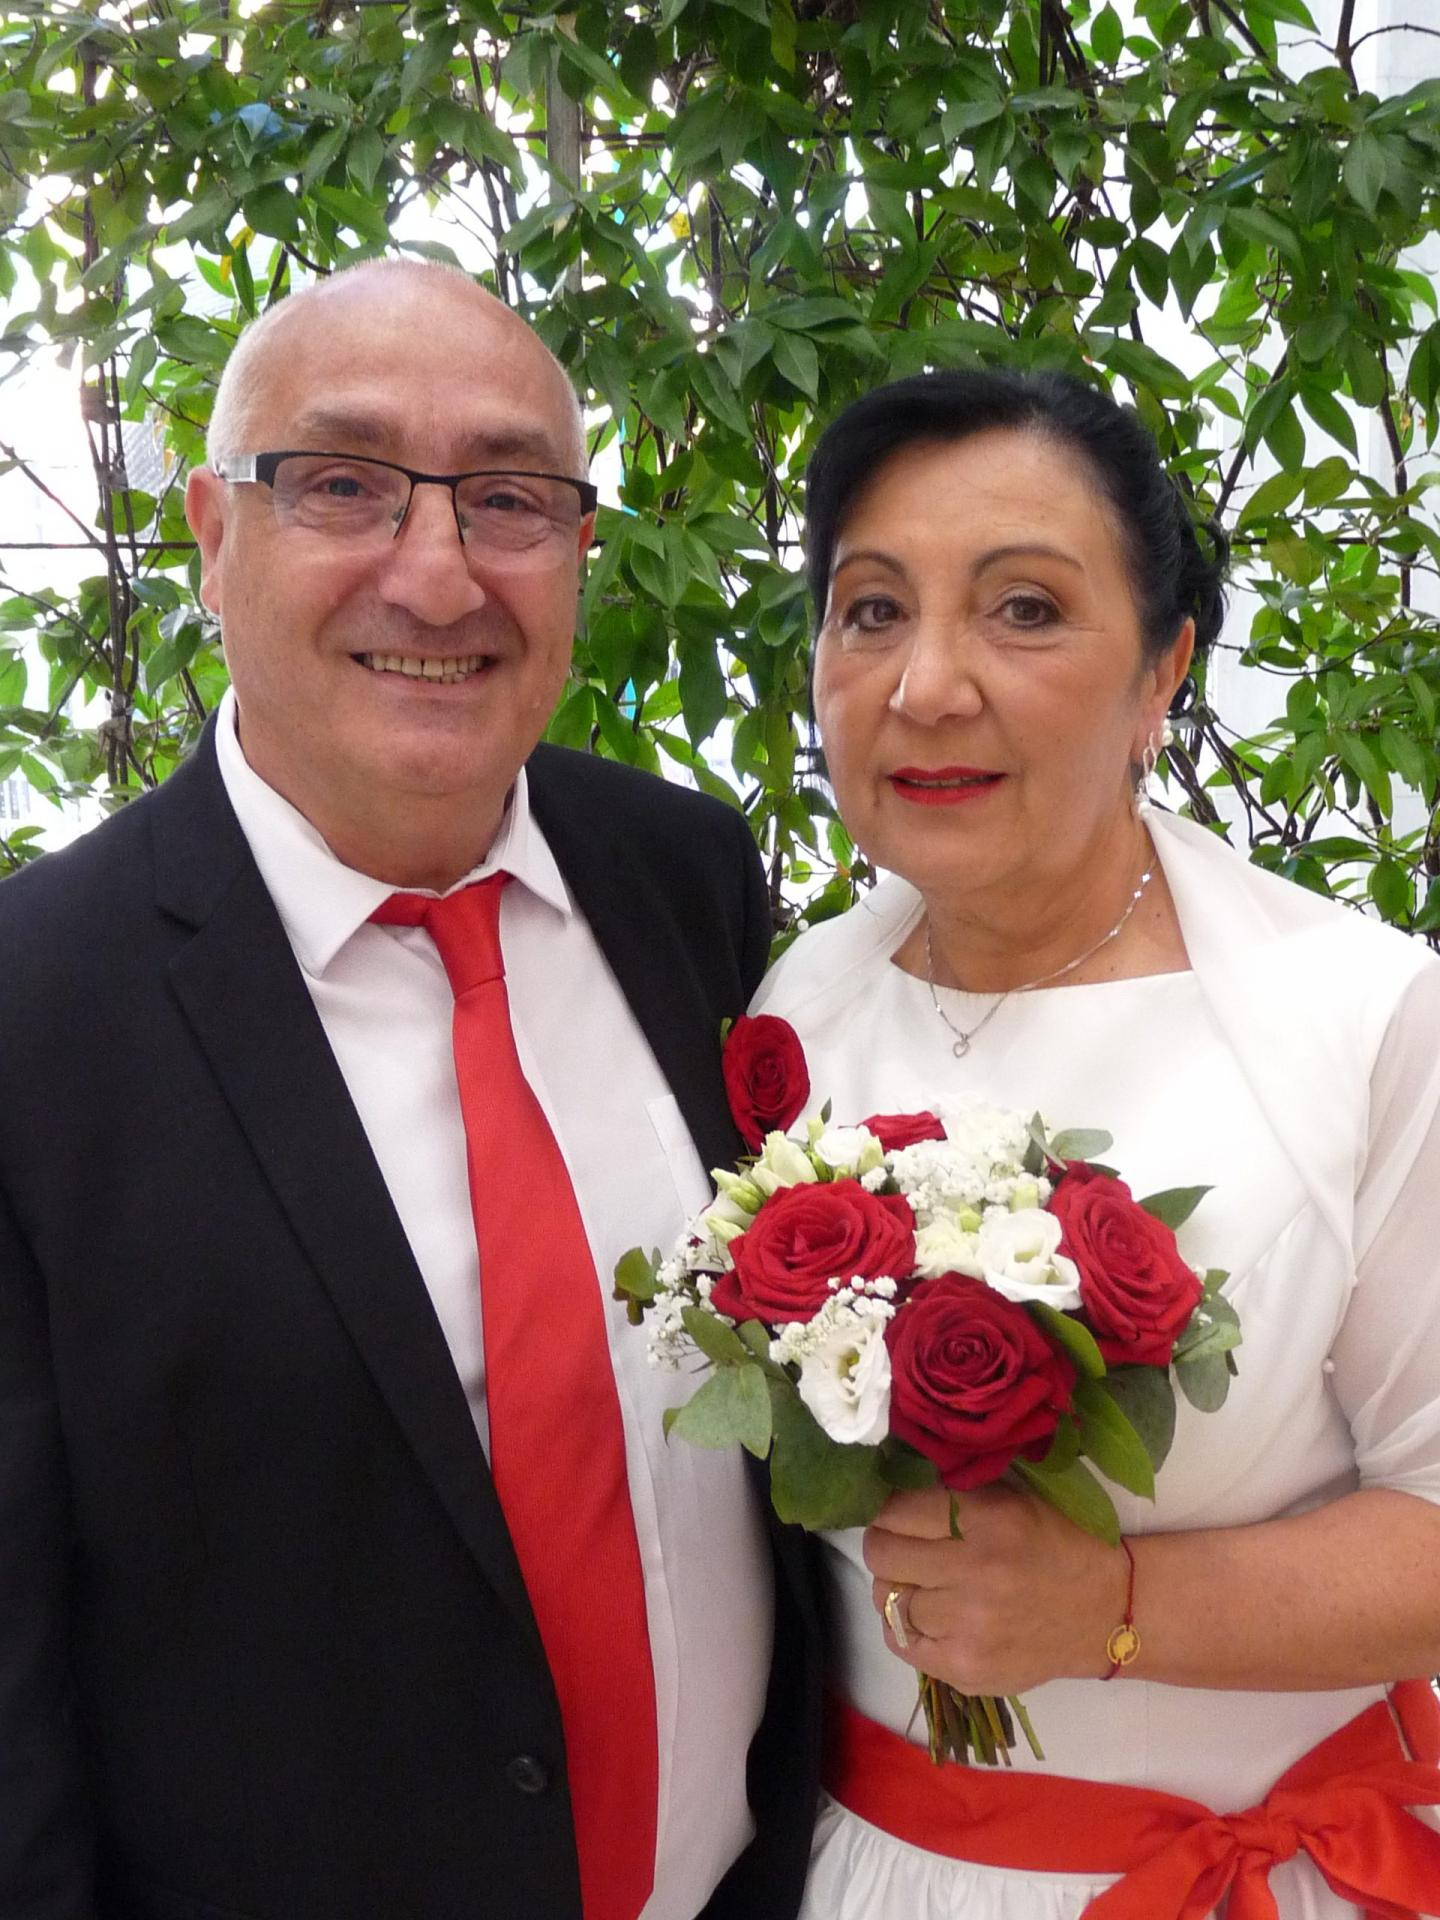 Vincenzo Magaletti, sans emploi, et Isabelle Cocco, agent administrative.